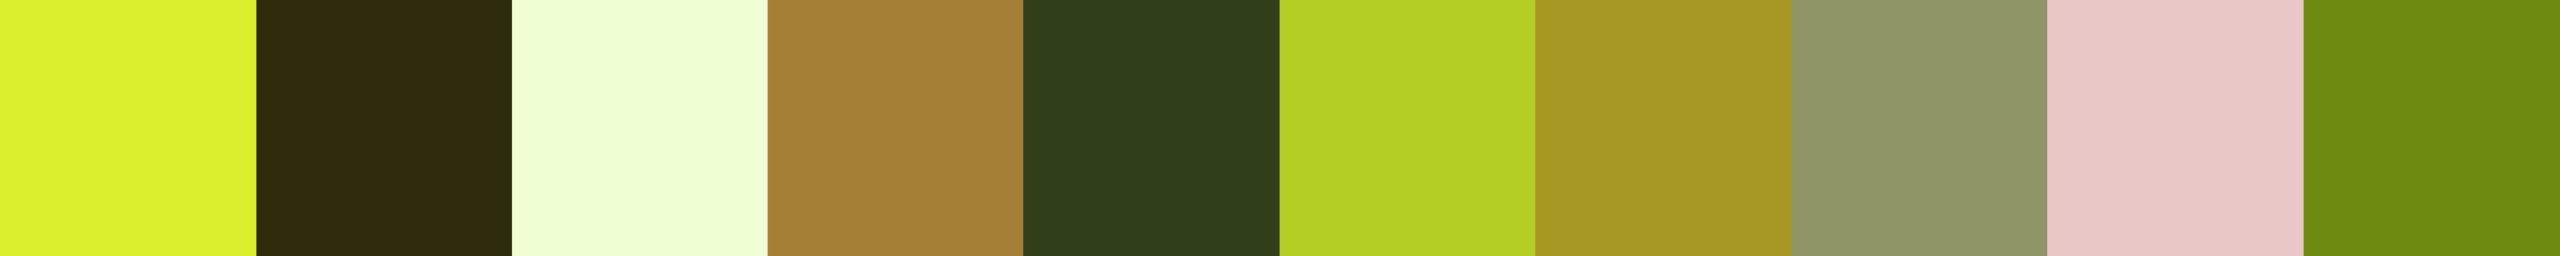 103 Gavana Color Palette